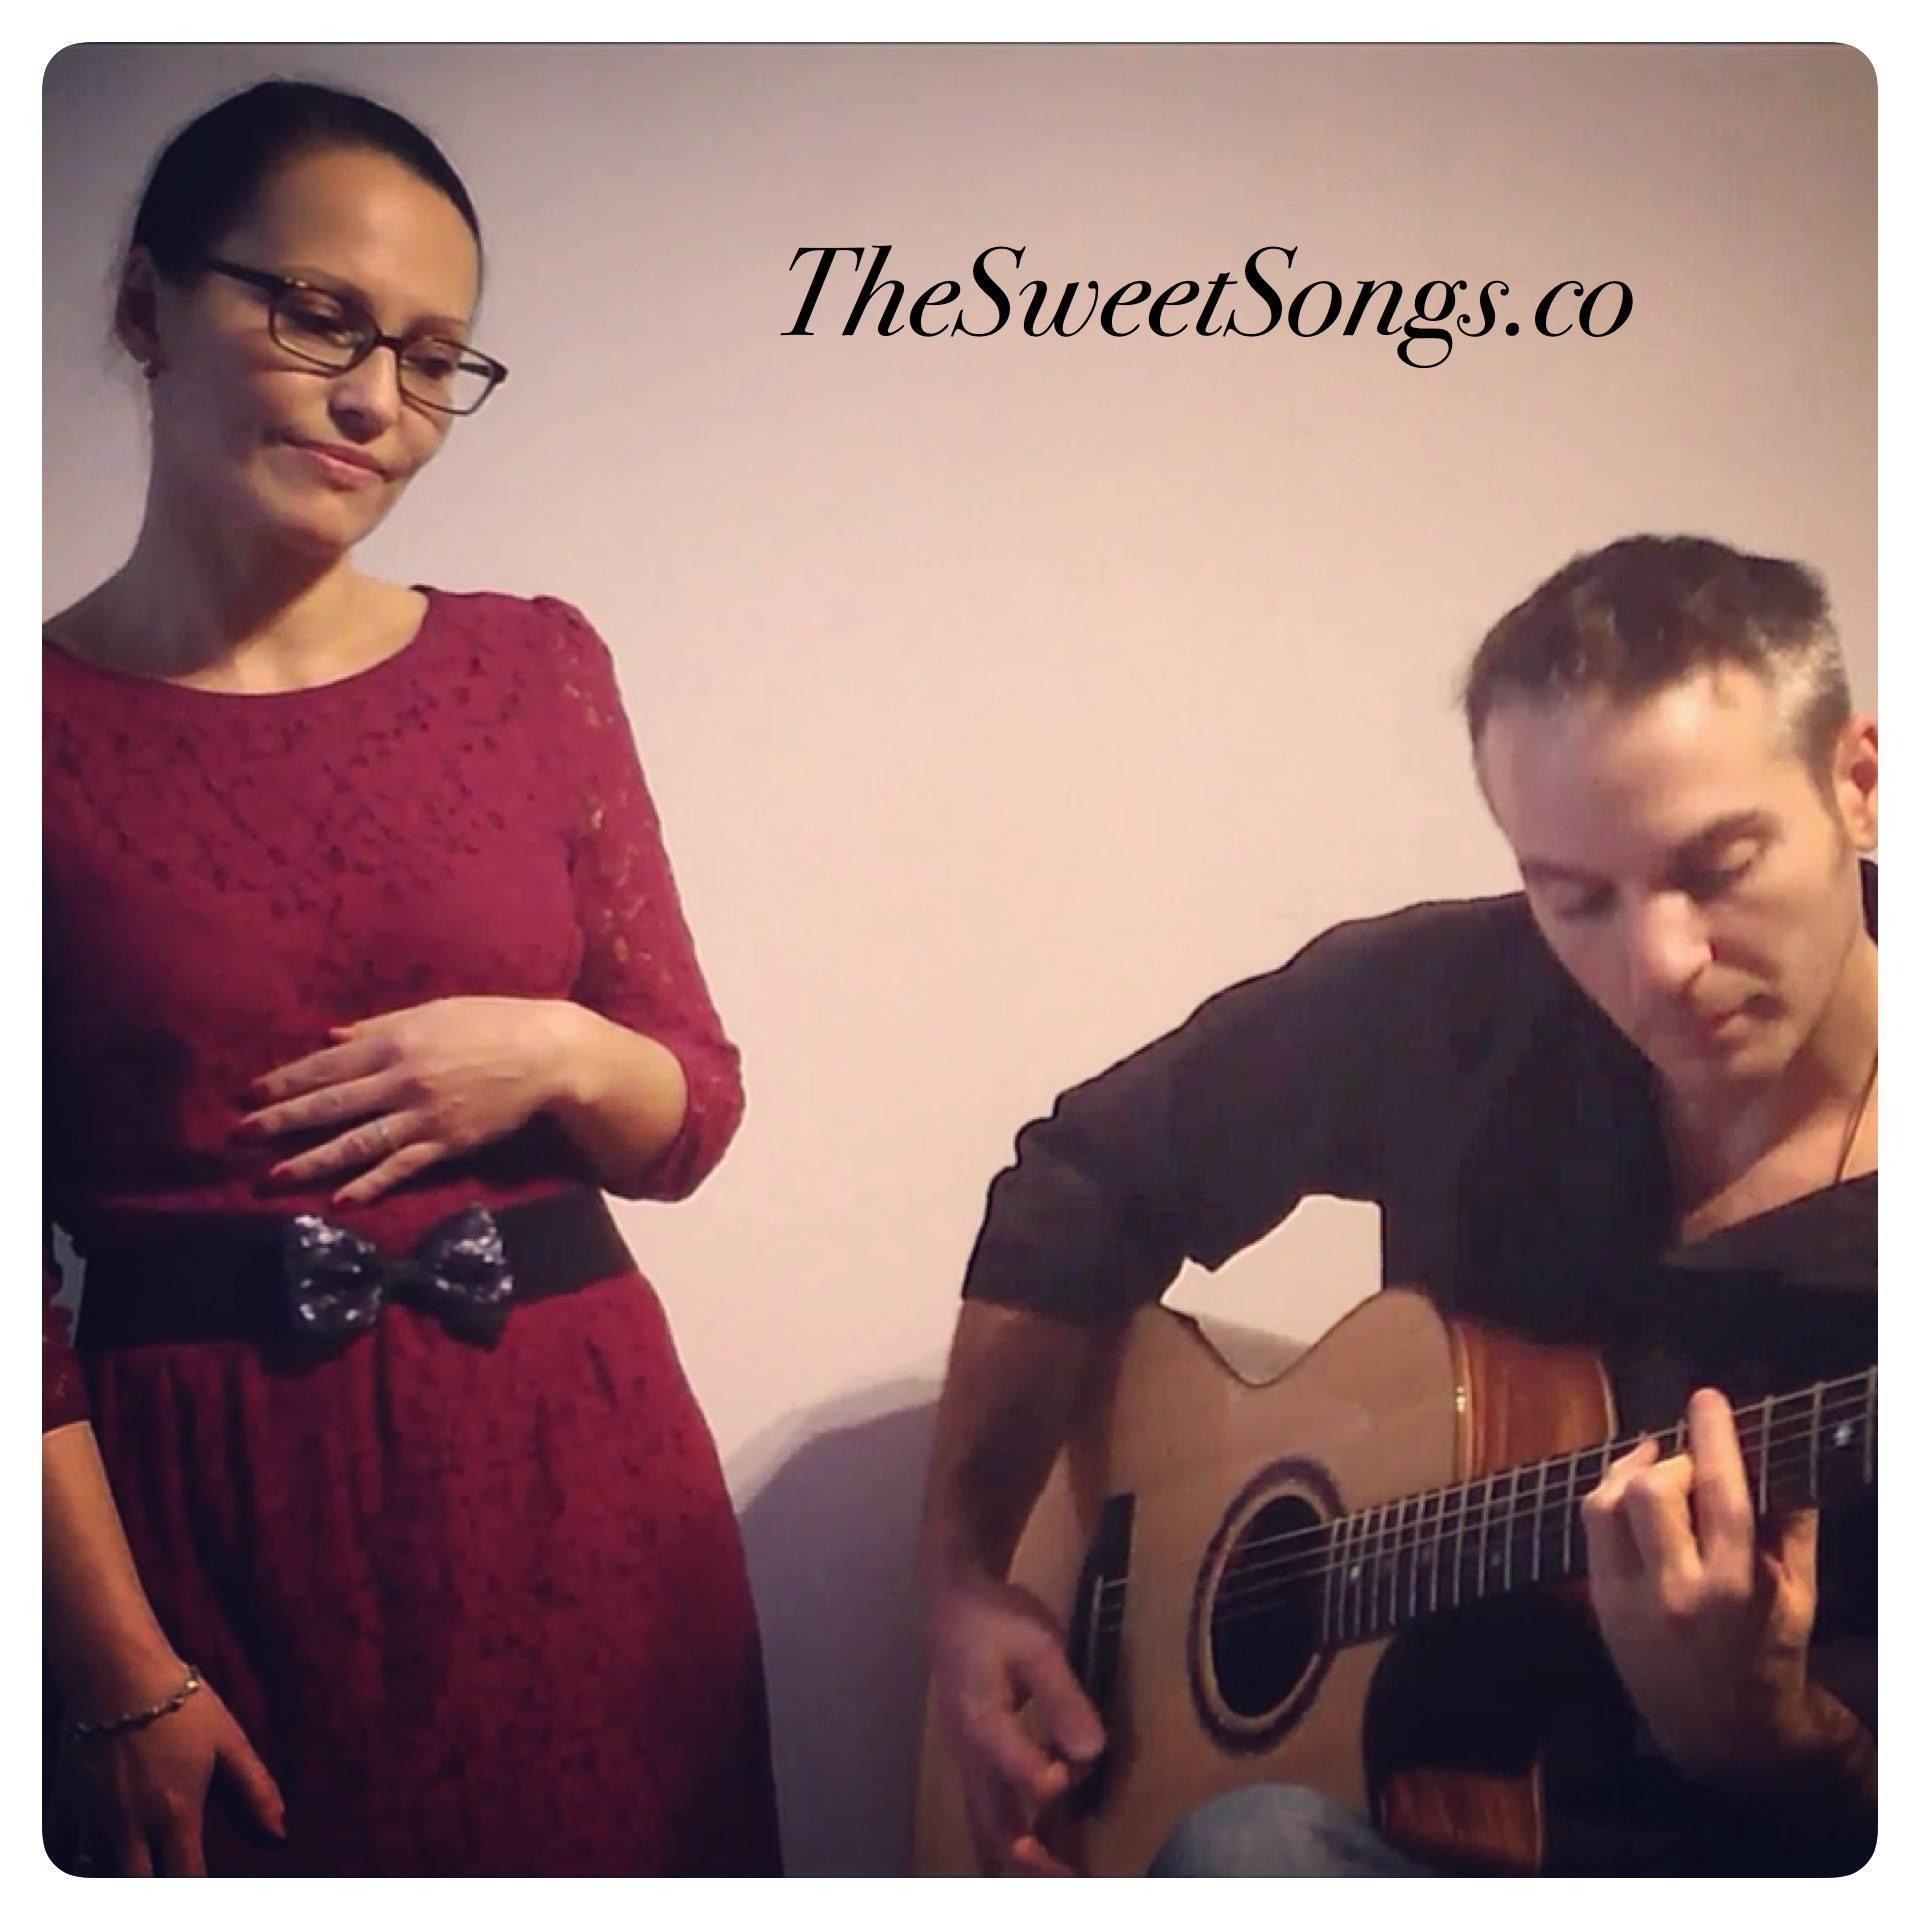 The Sweet Songs